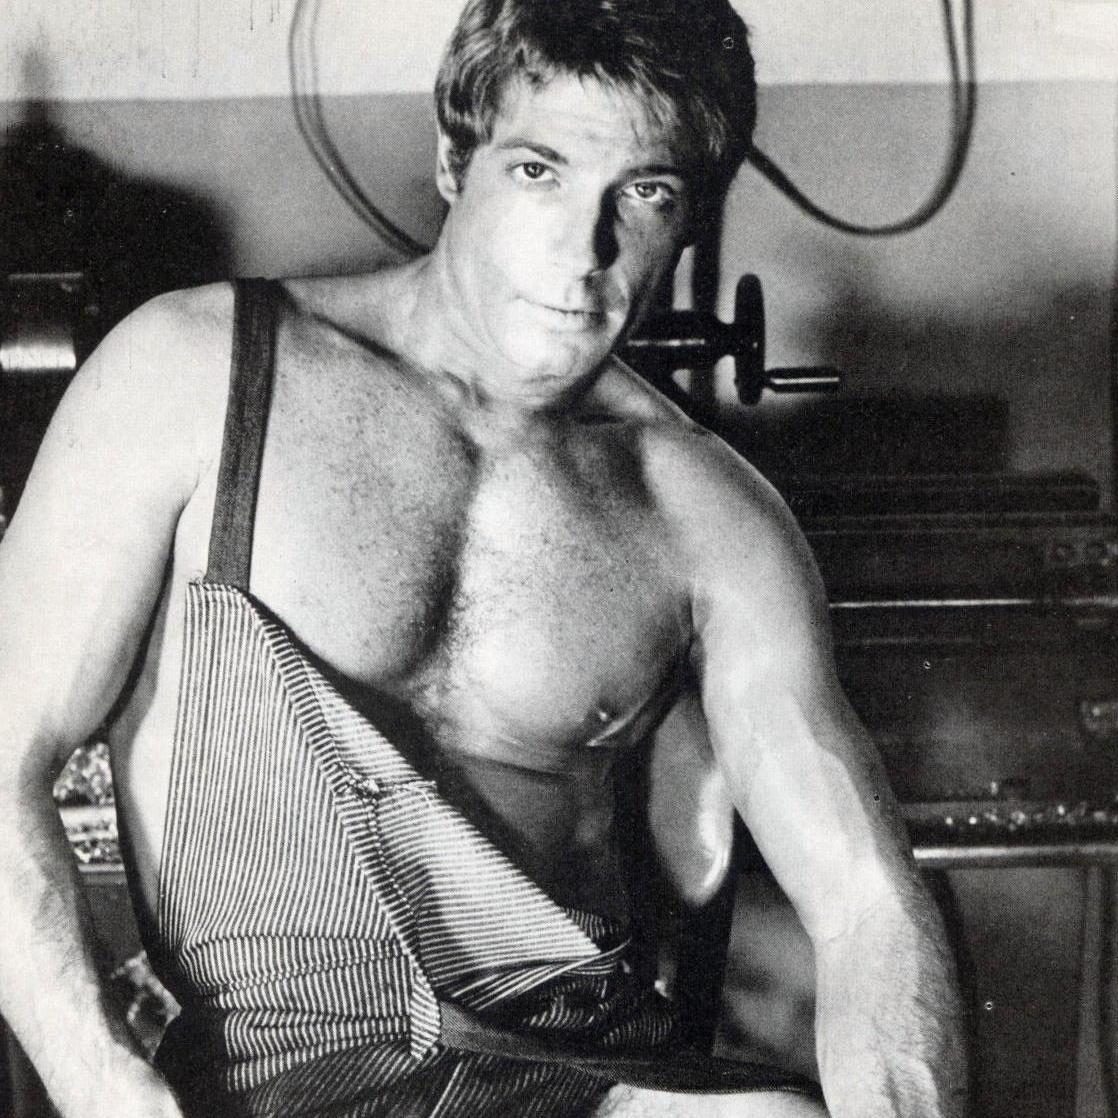 Jack Wrangler Nude Pics 30